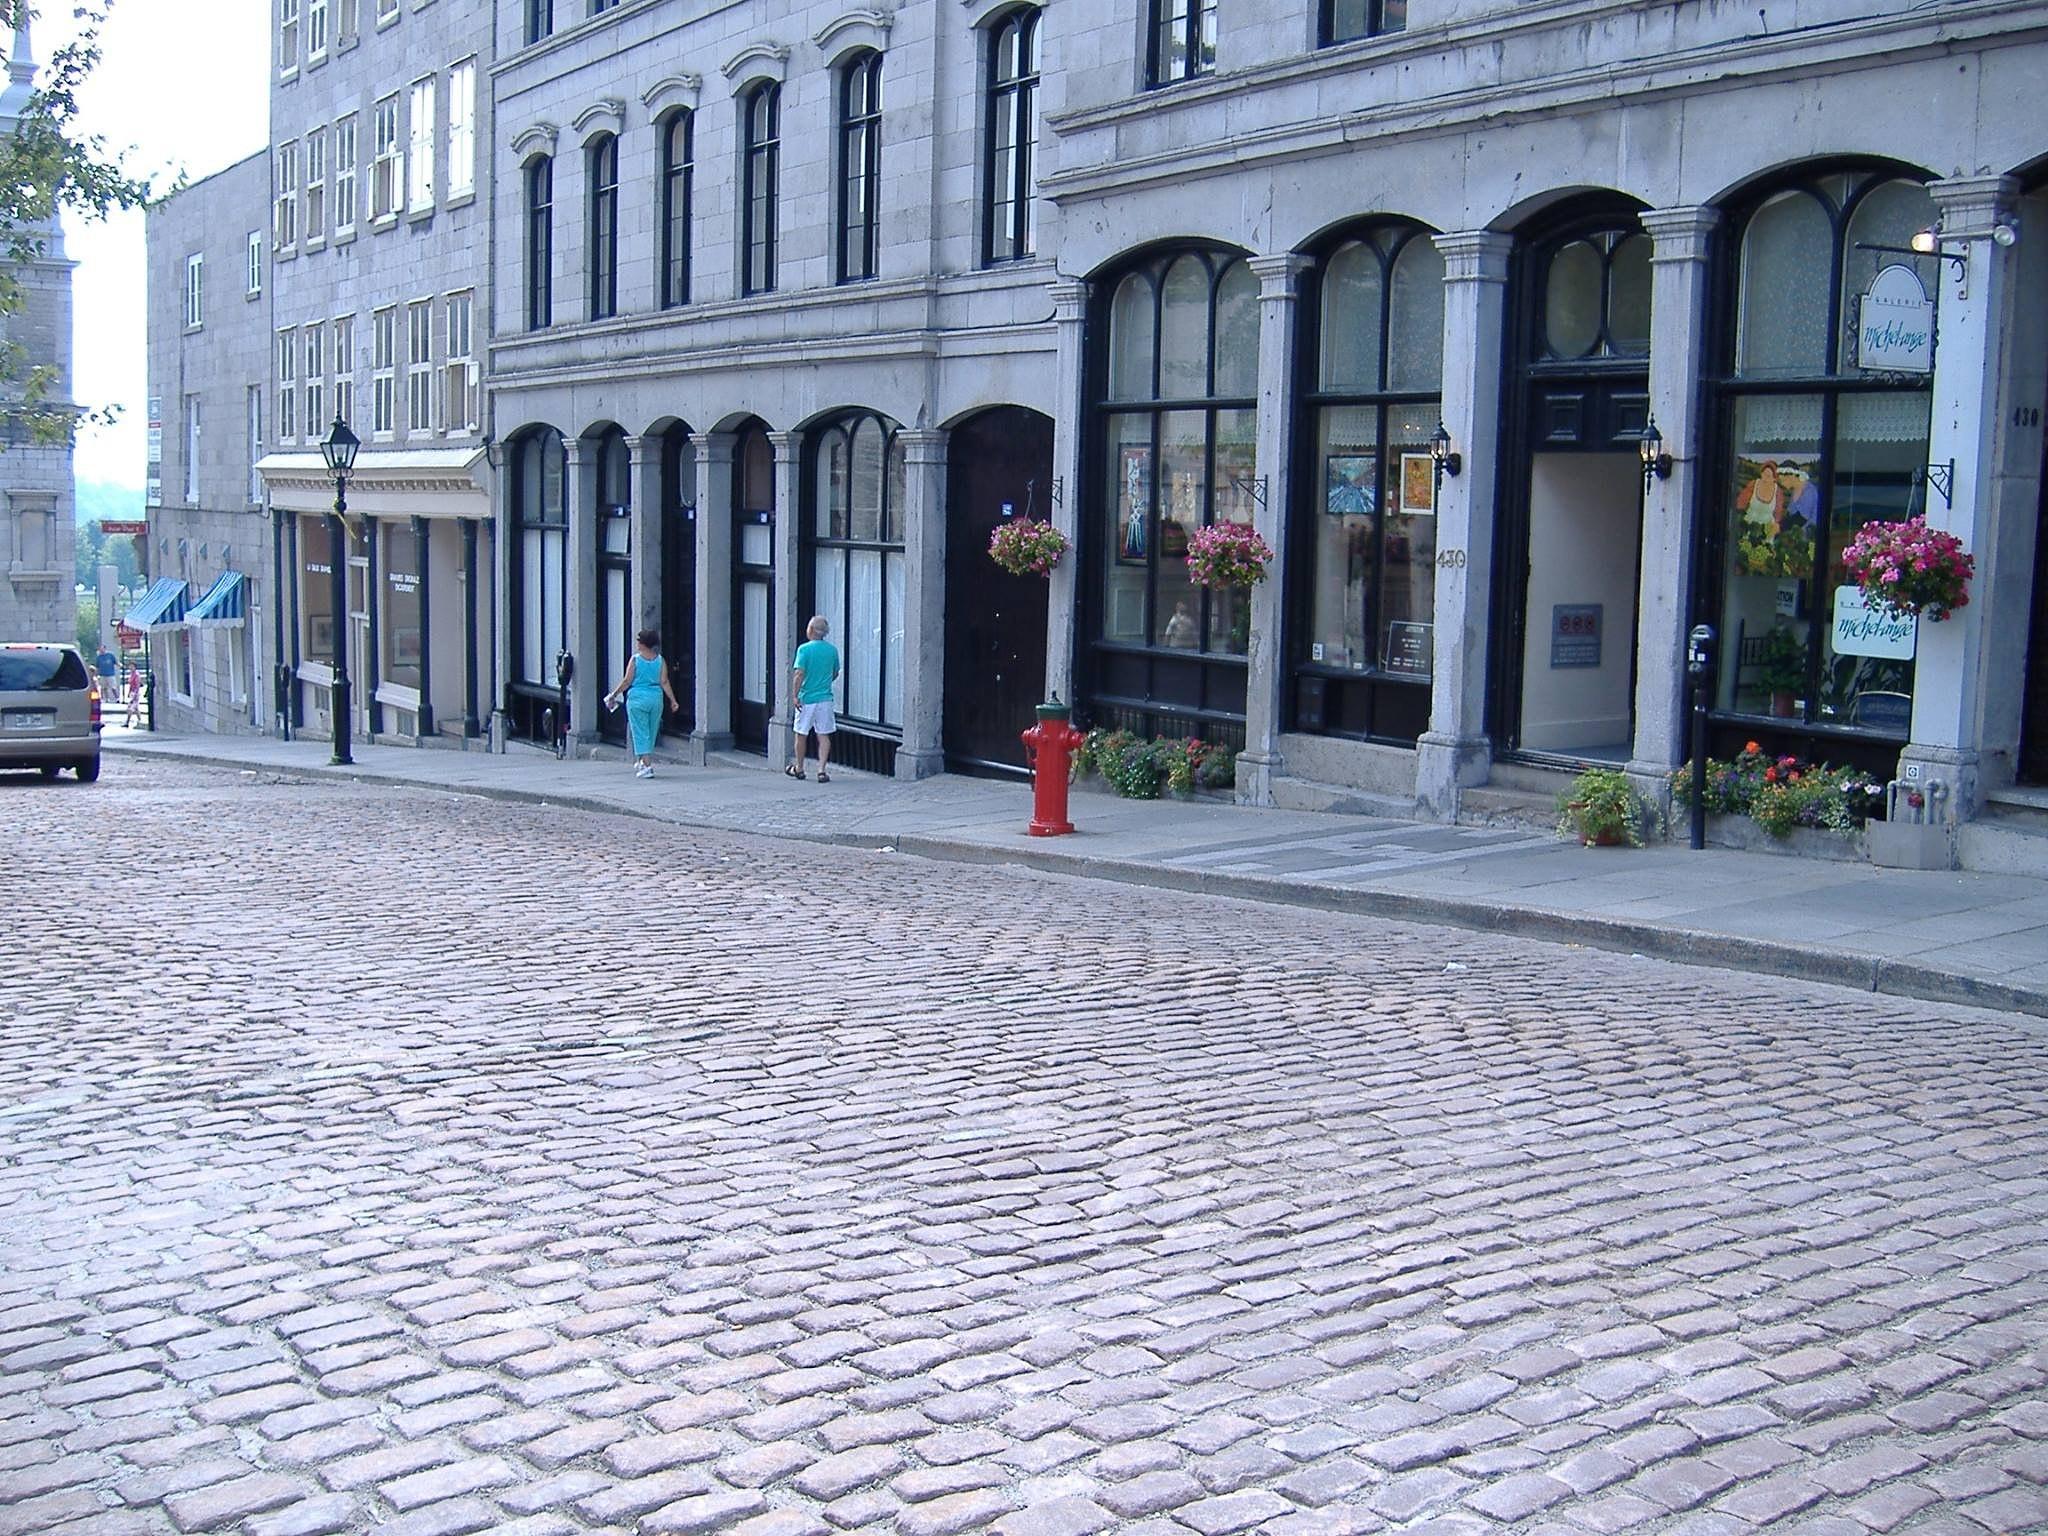 Old Town by joann.kunkle